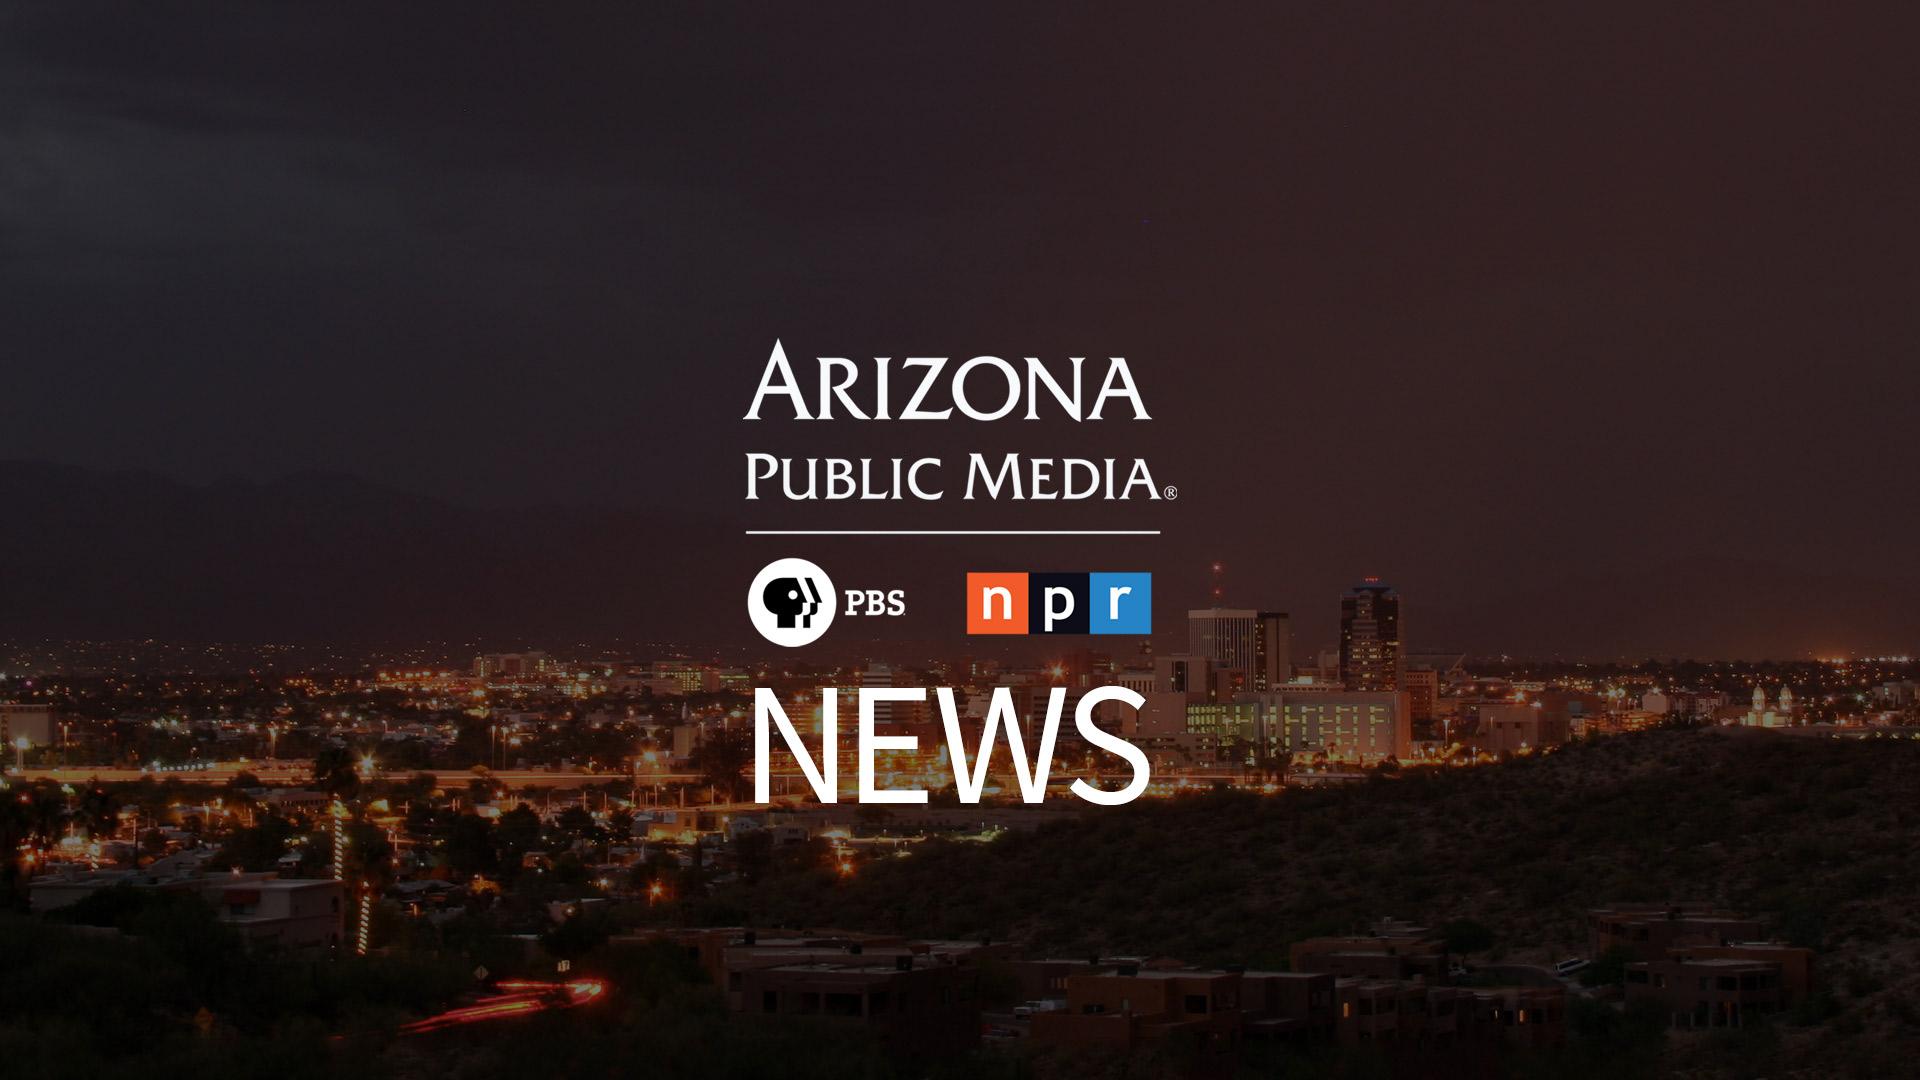 Arizona Public Media.